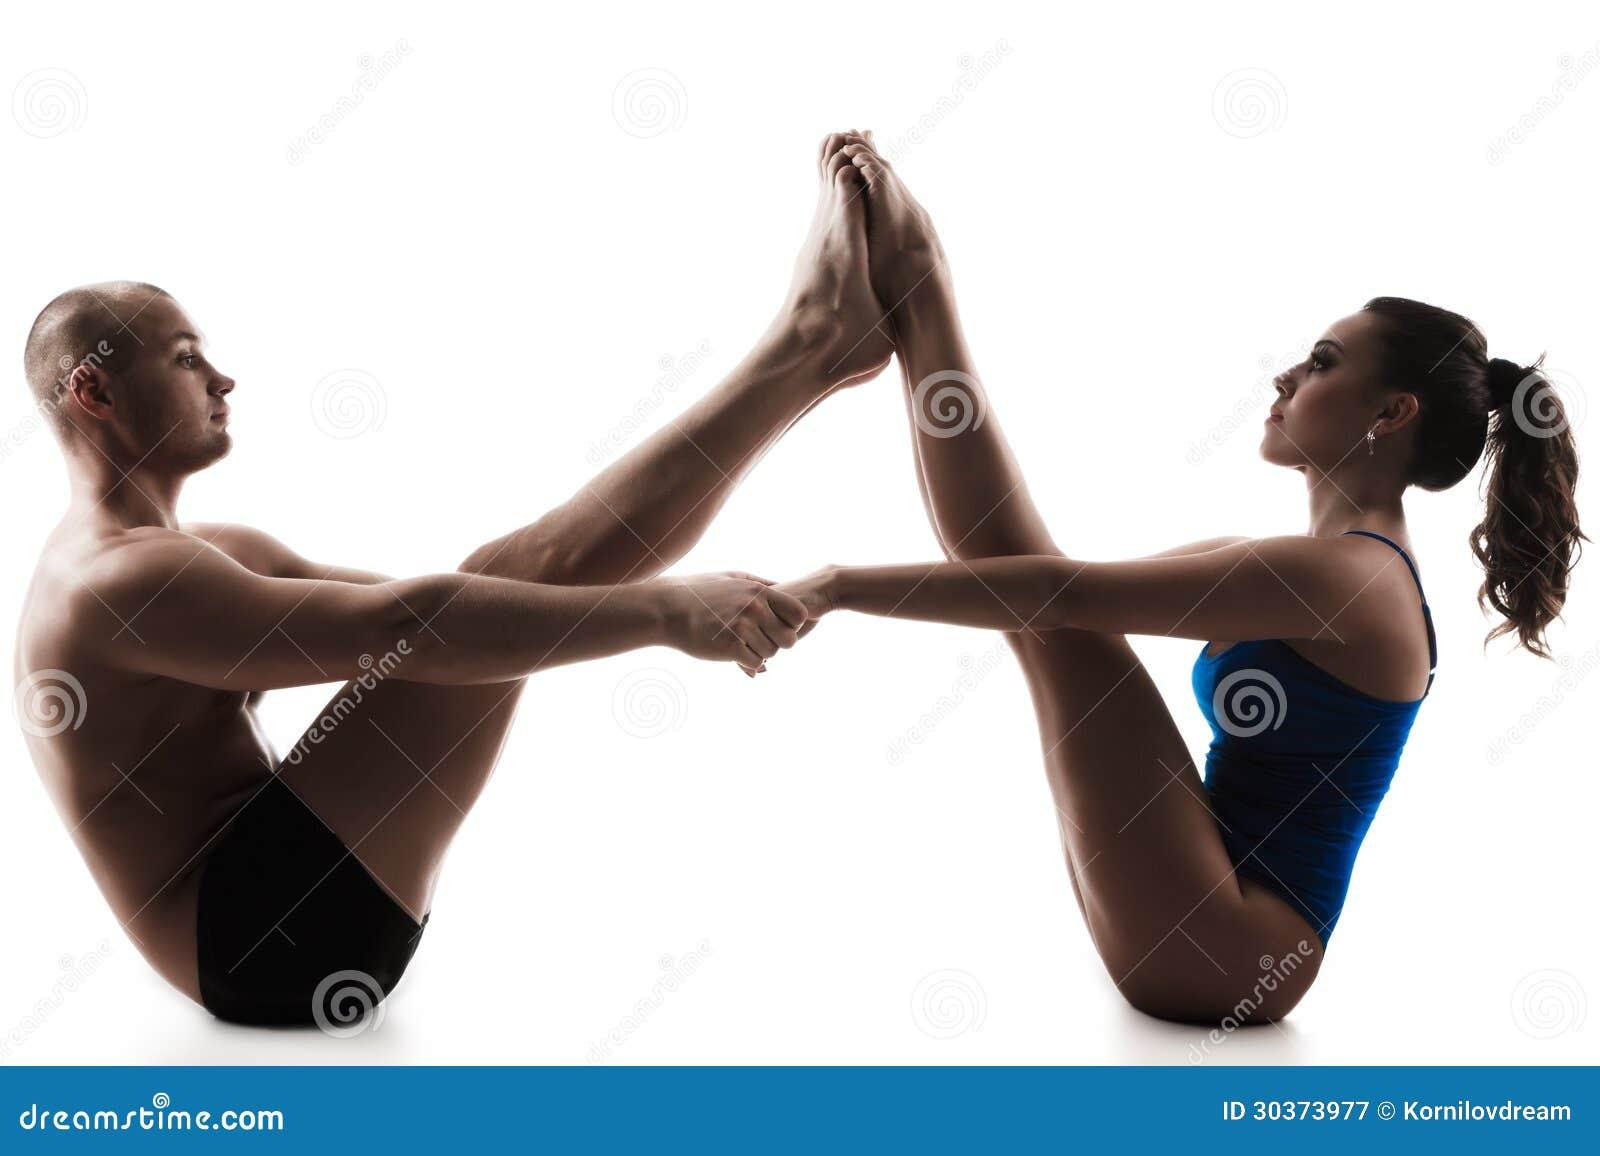 Download Pose De Bateau Dasana Nauka Yoga Couples Image Stock